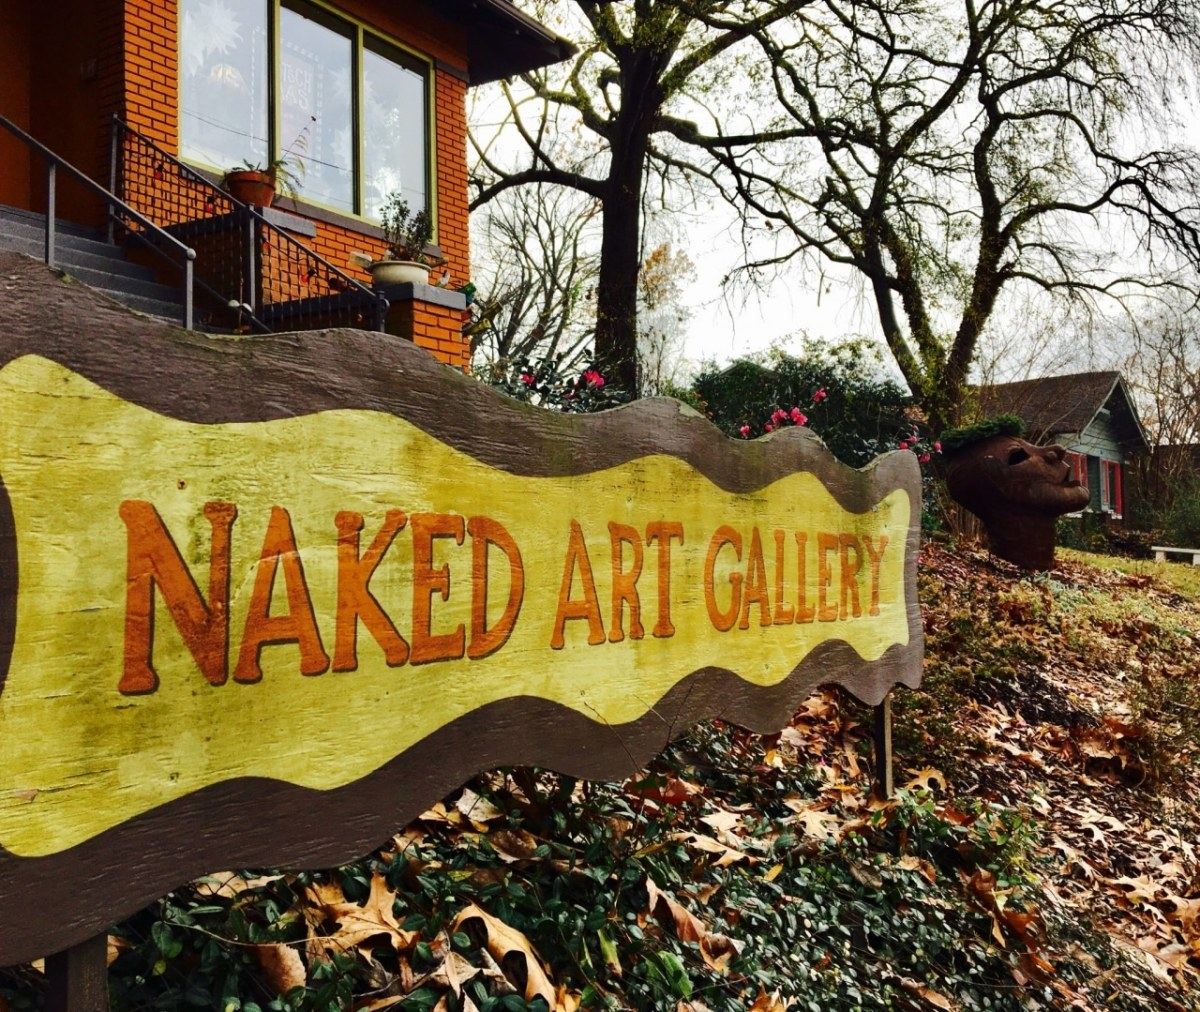 Shop Local: Naked Art Gallery (3 photos)